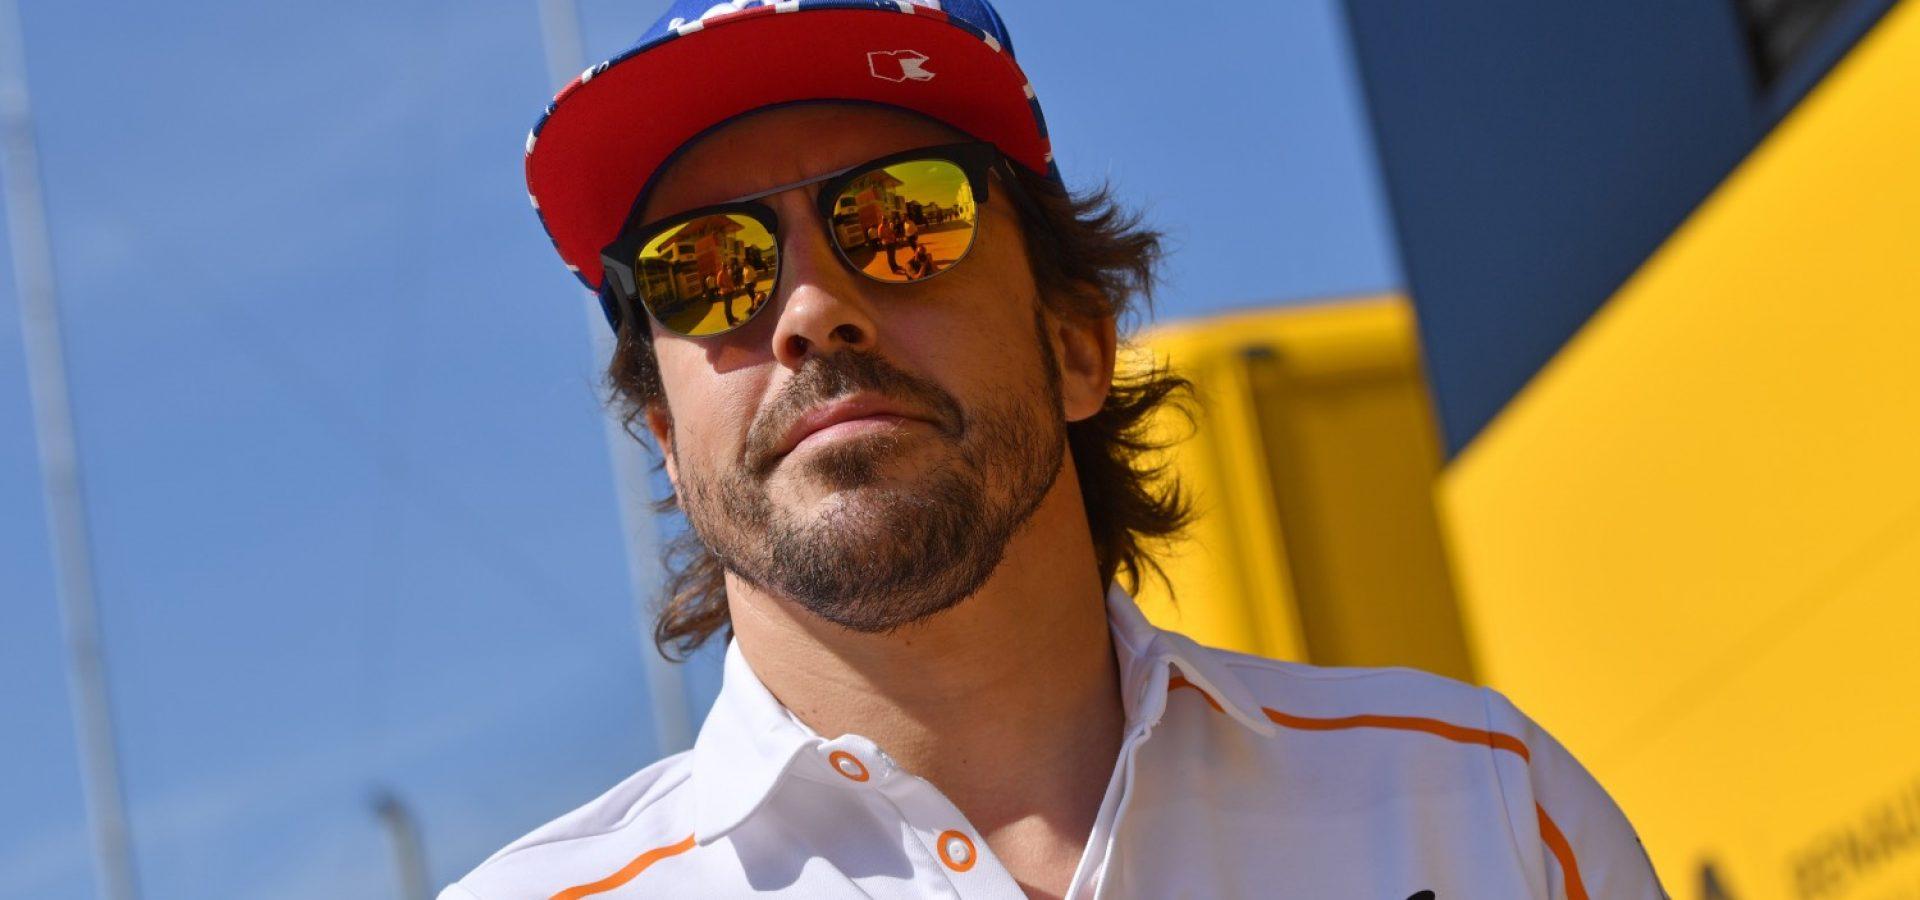 Silverstone Circuit, Northamptonshire, UK Saturday 7 July 2018. Fernando Alonso, McLaren. Photo: Jerry Andre/McLaren ref: Digital Image dcb1807jy05